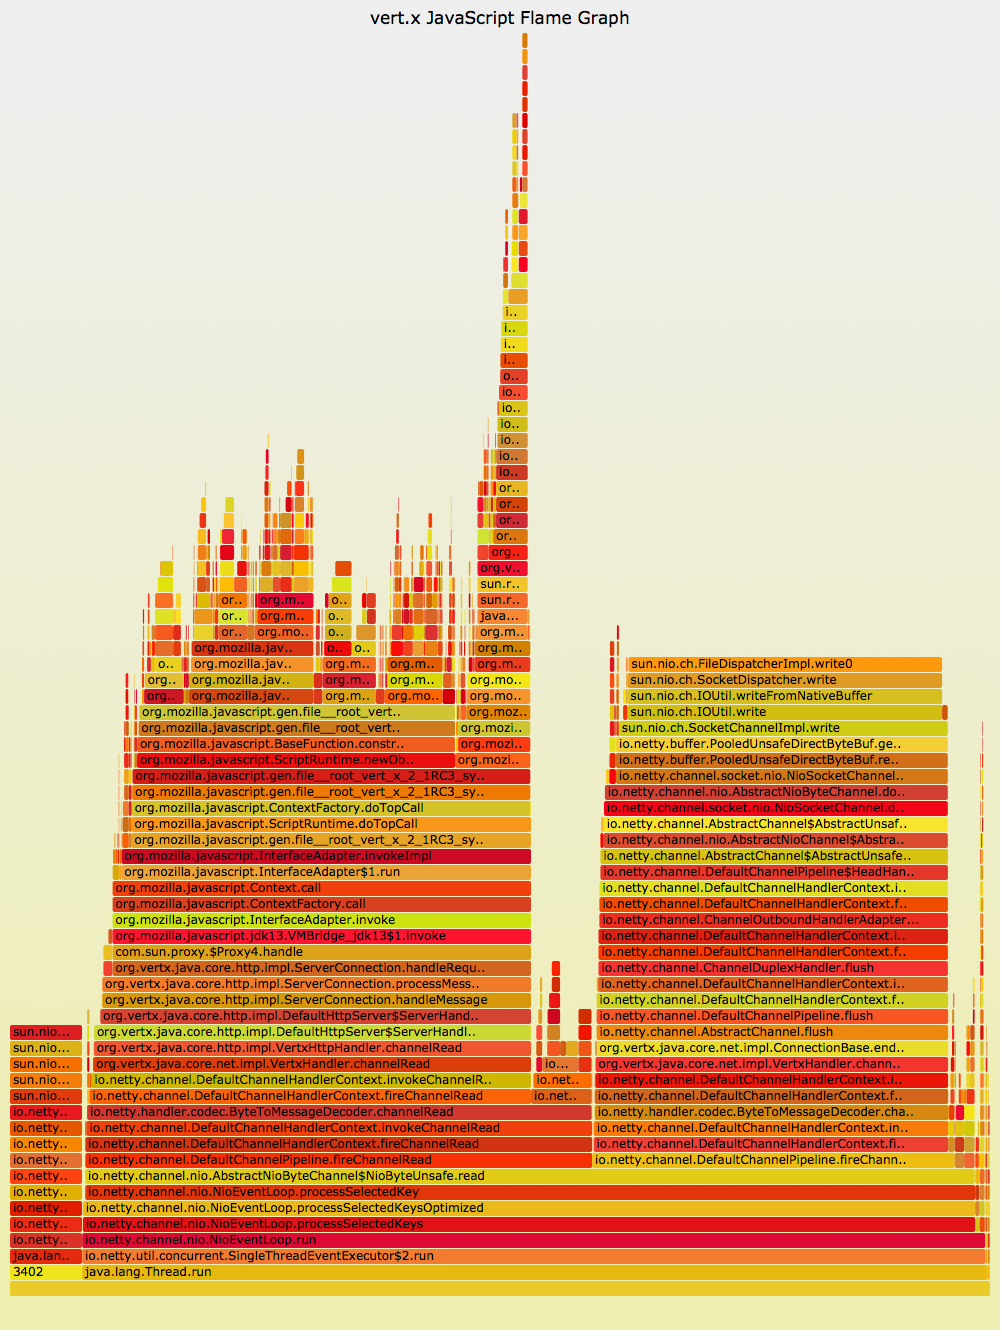 Java Flame Graphs